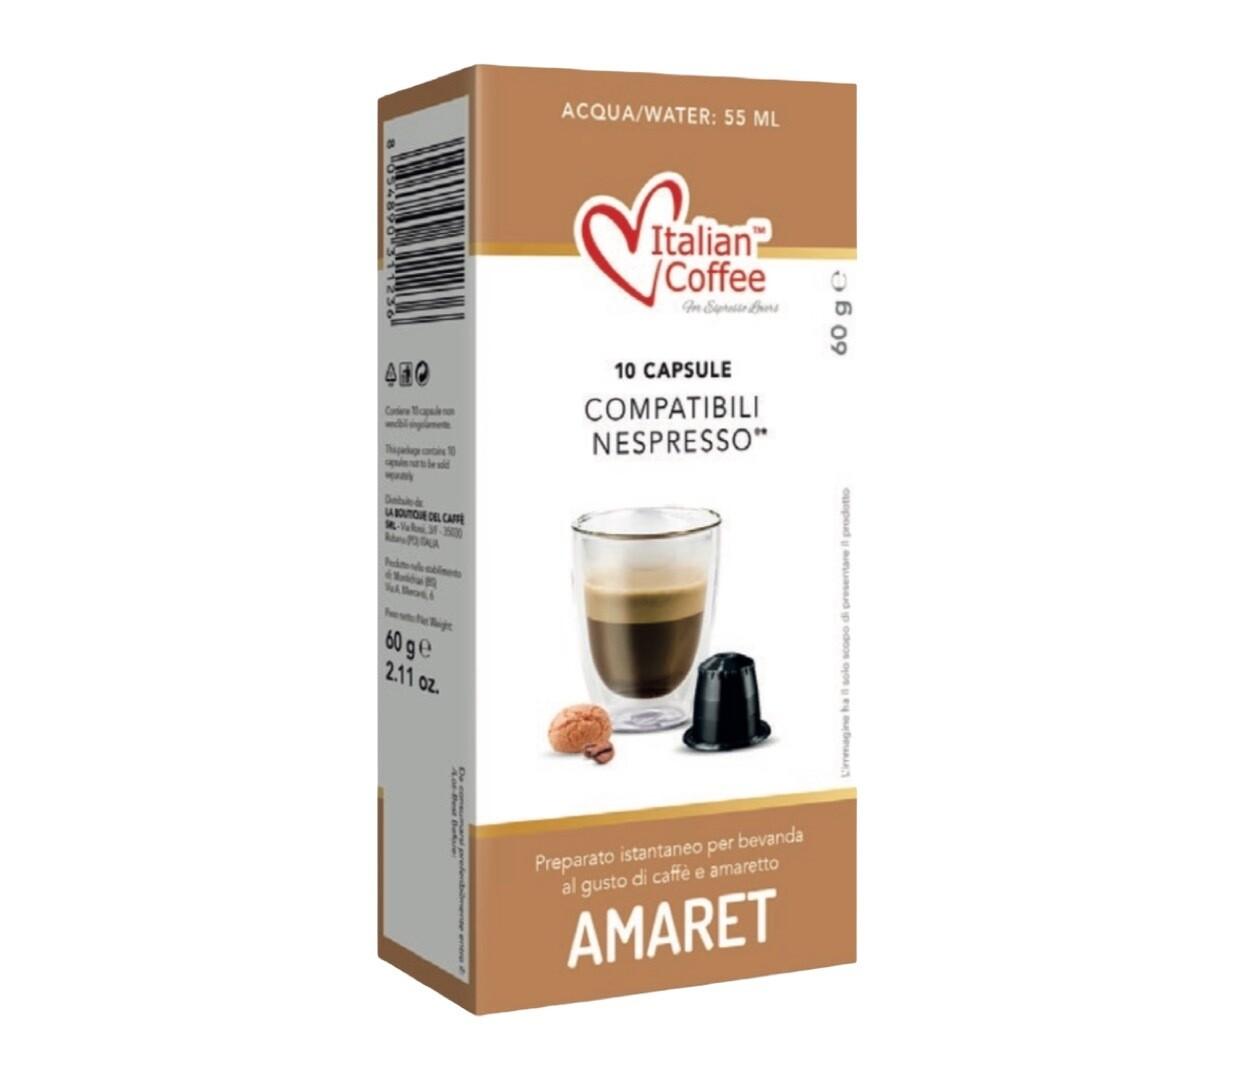 Italian Coffee™️comp. Nespresso* Amaret Амарето (бадем) Макијато х10капсули